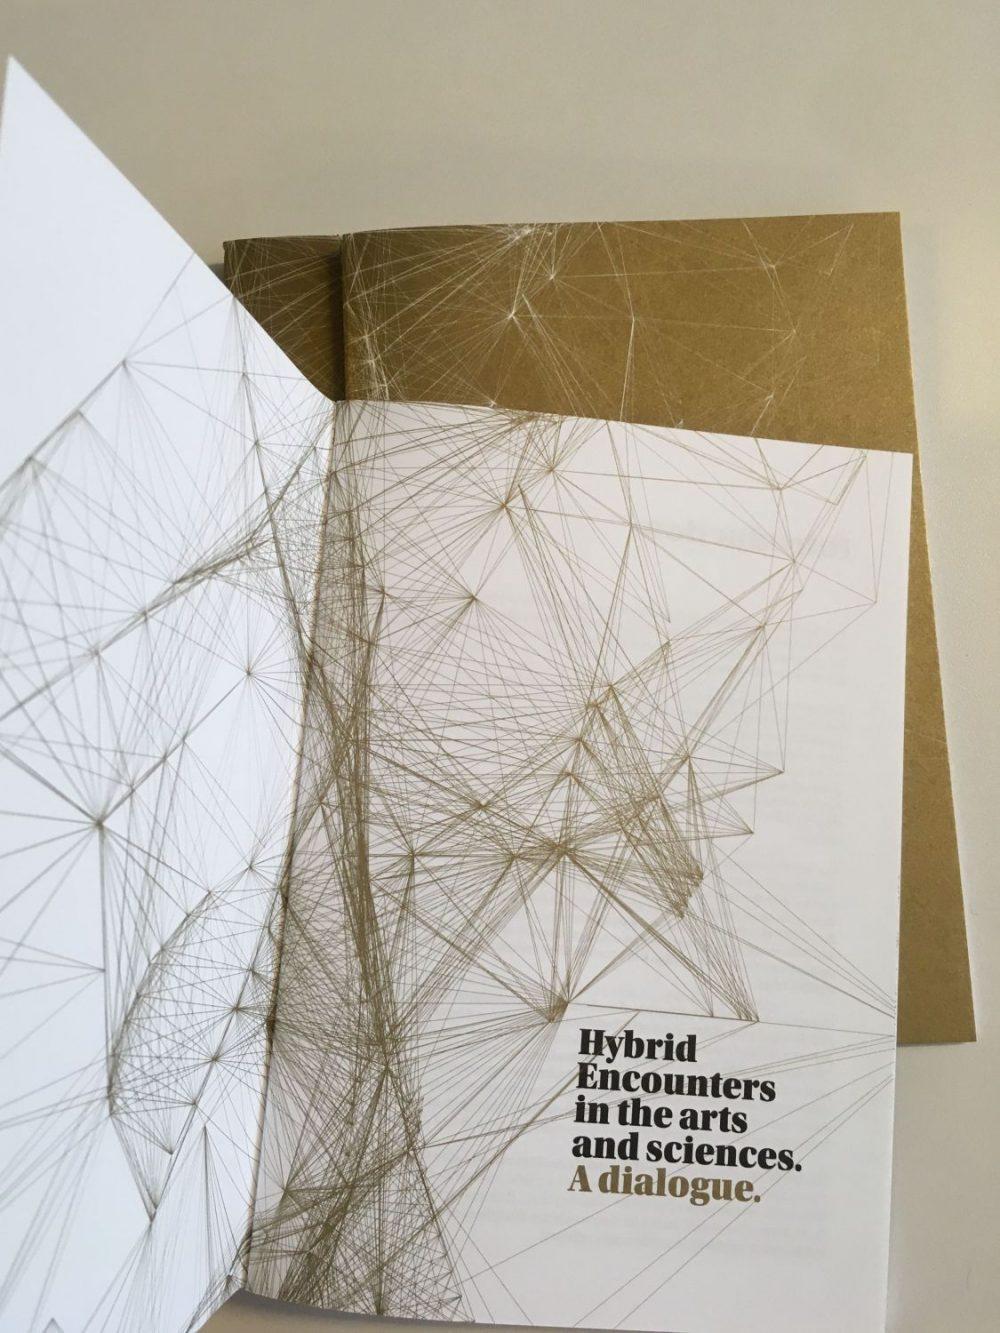 Publikation Hybrid Encounters in the arts and sciences (2020). Foto: Hybrid Plattform.